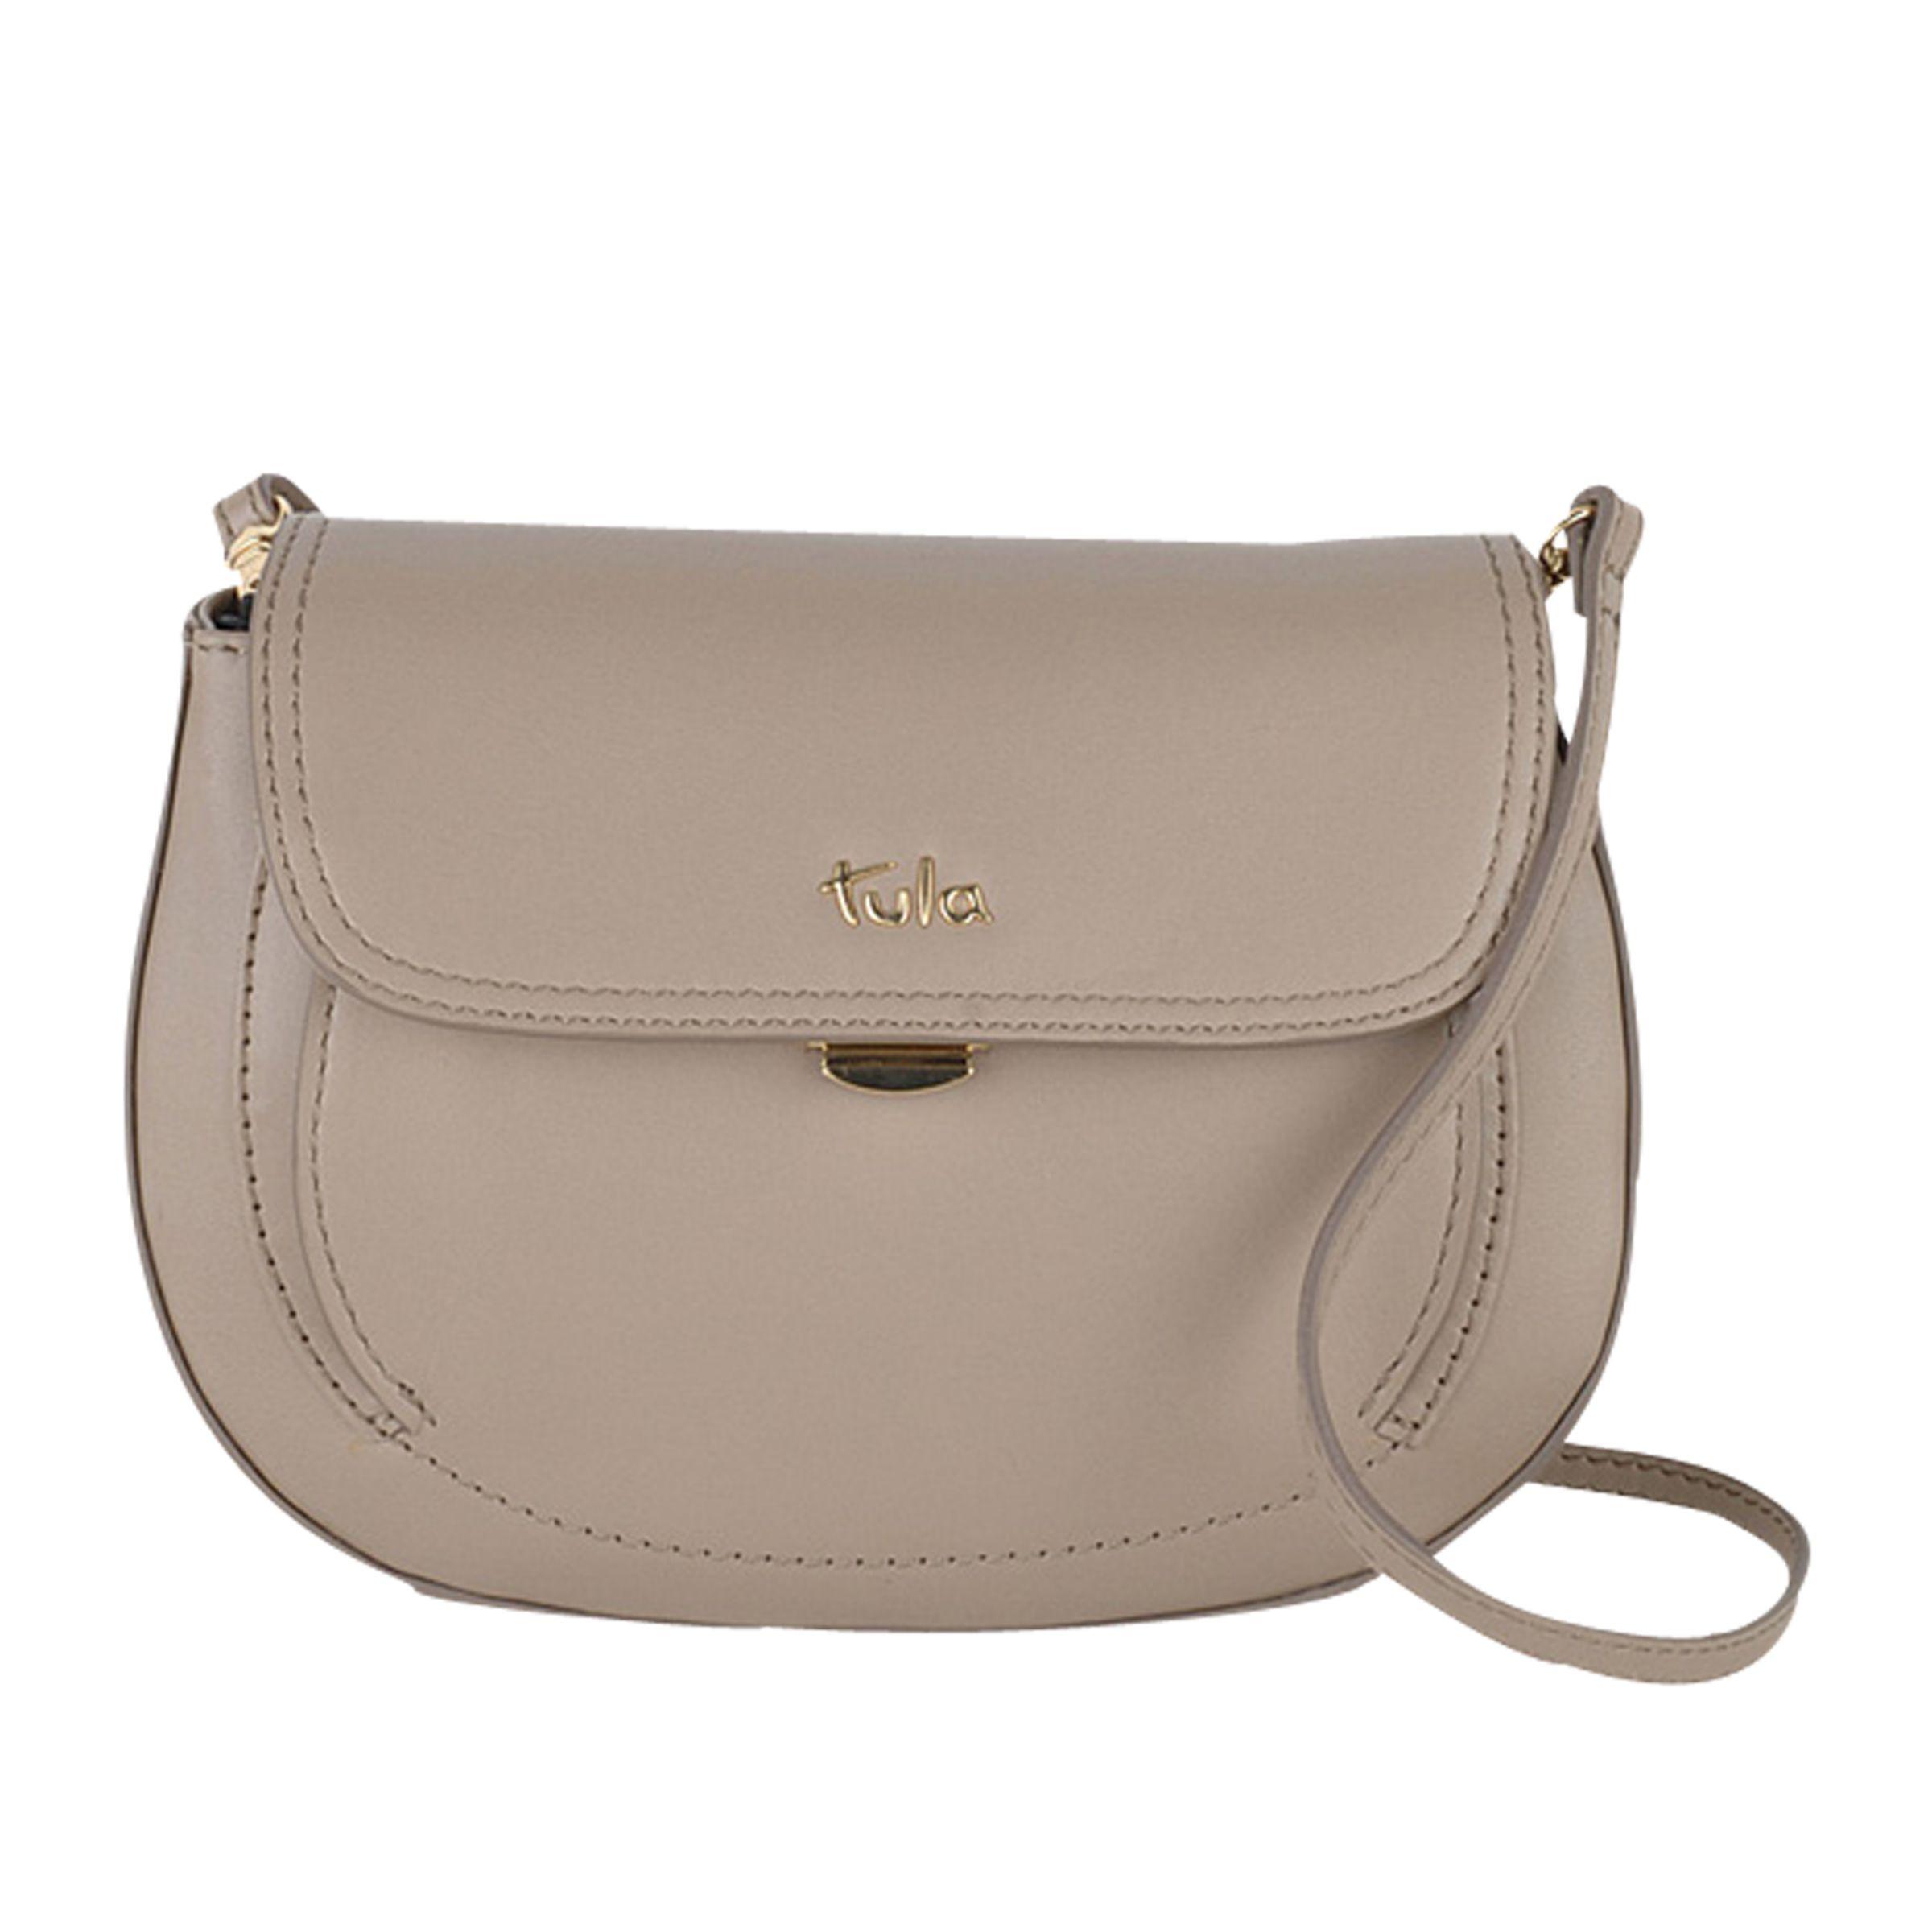 Tula Tula Bella Leather Small Across Body Bag